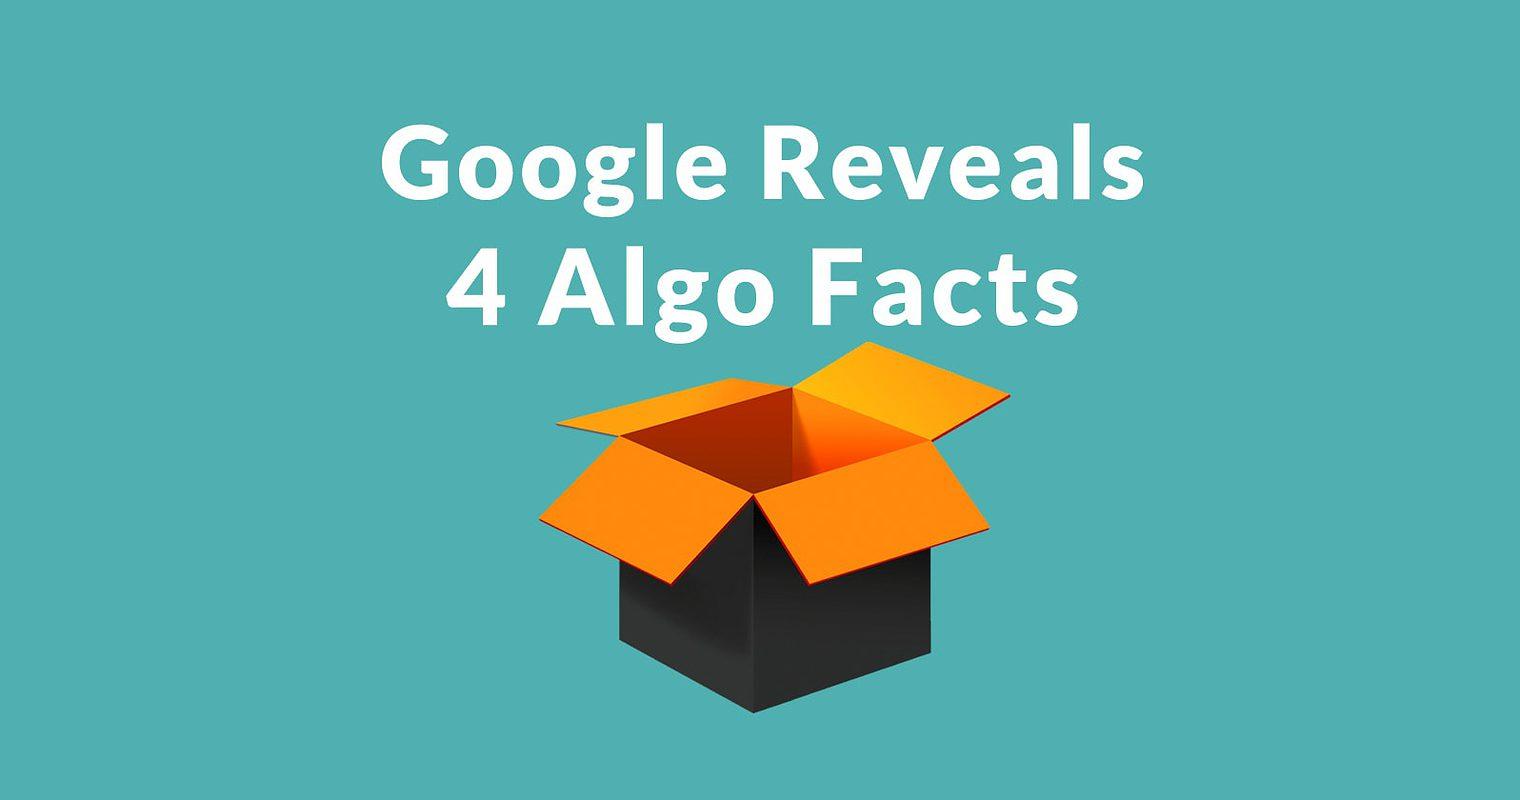 4 New Insights Into Google's Algorithm